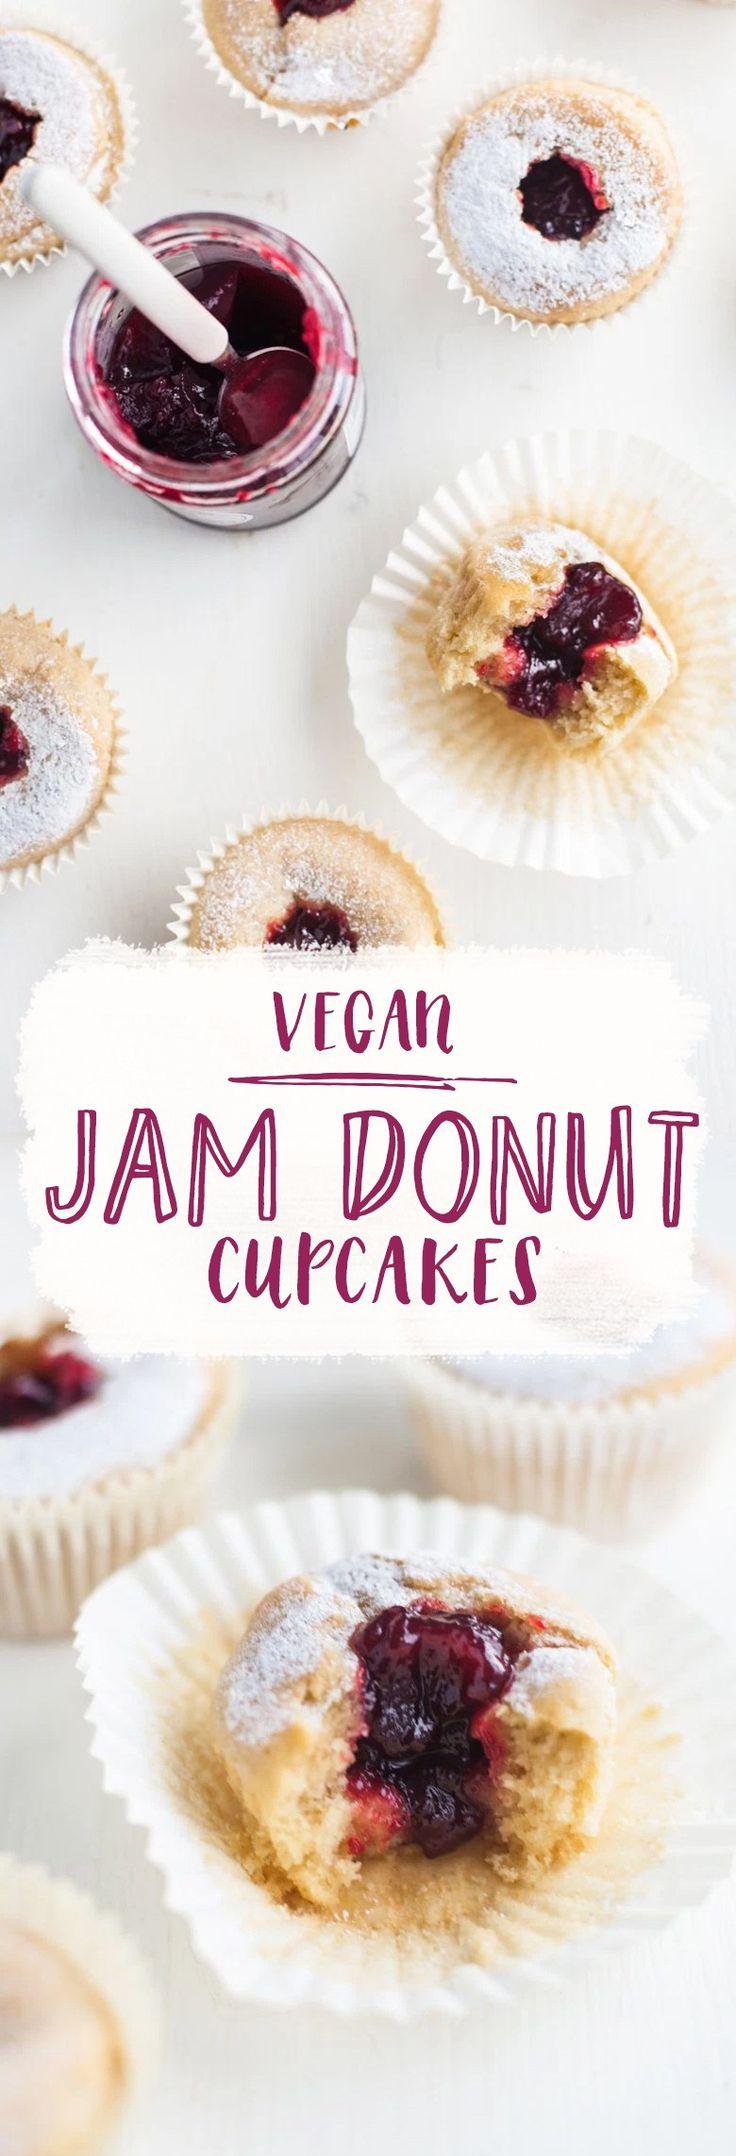 Vegan Jam Donut Cupcakes